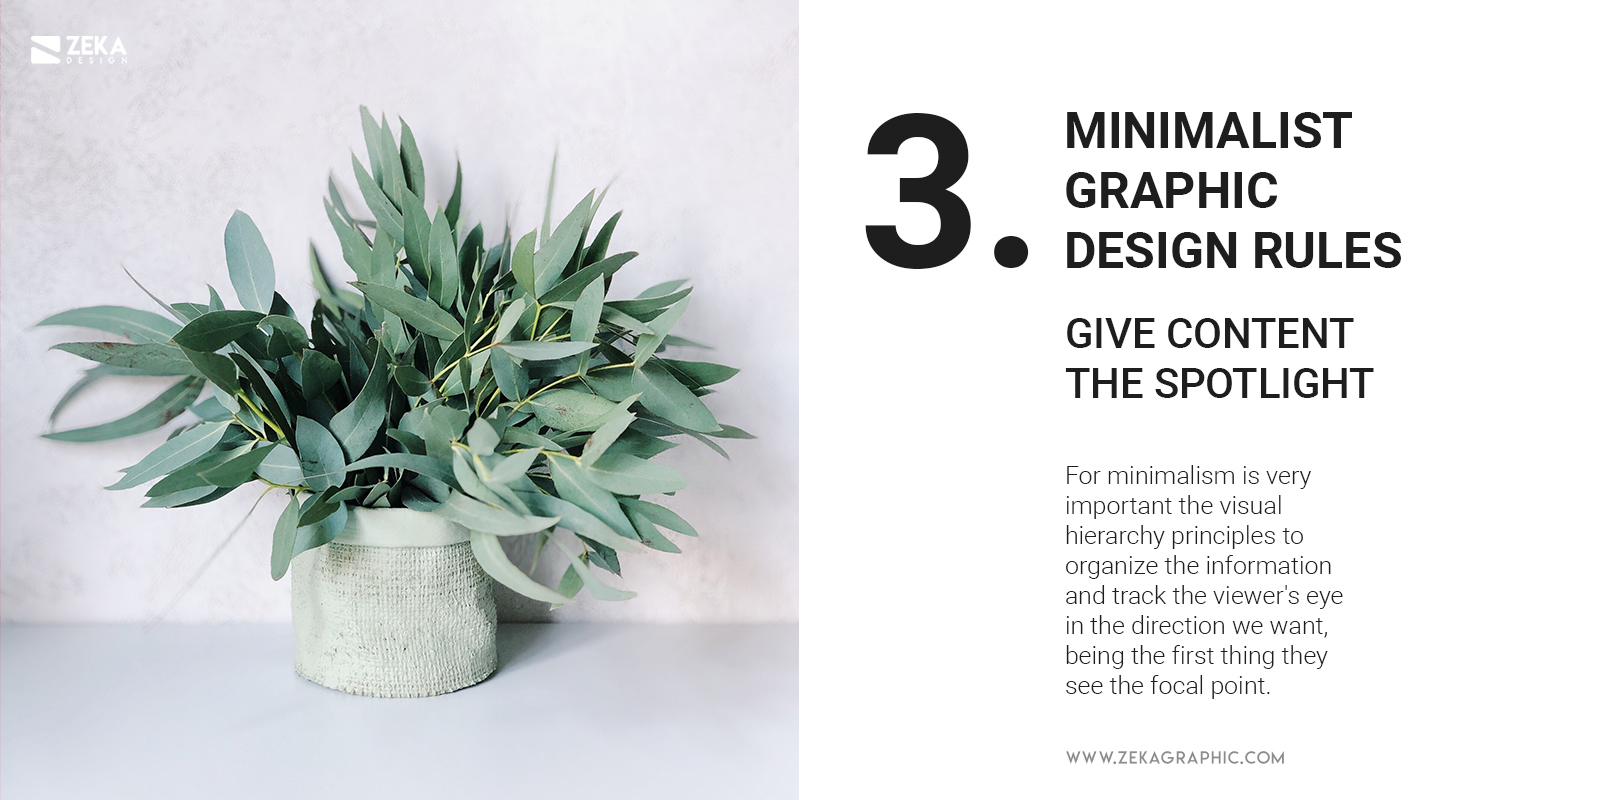 3 Give Content The Spotlight Minimalist Graphic Design